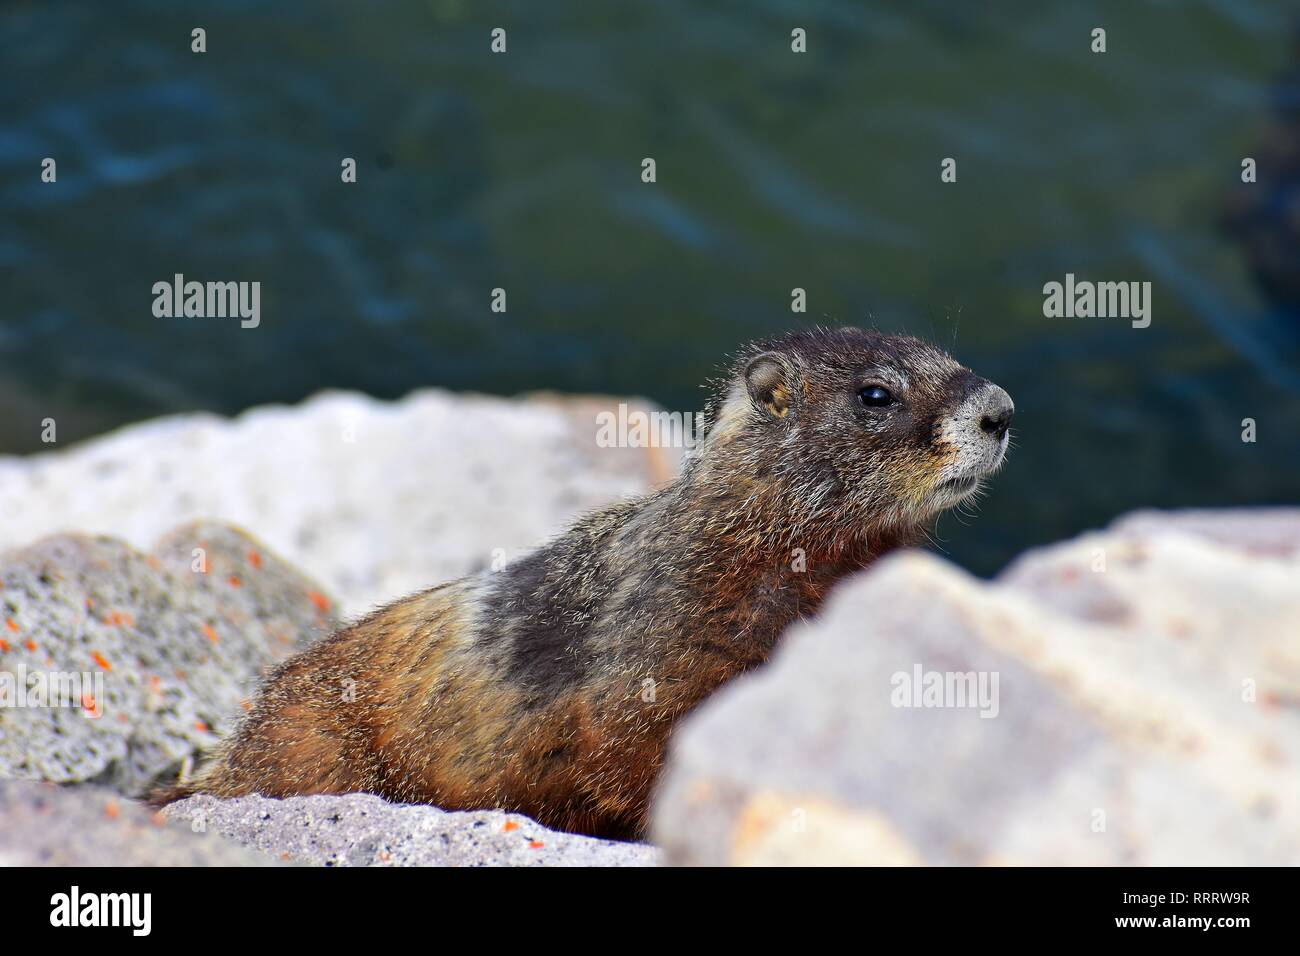 Martin the Marmot - Stock Image